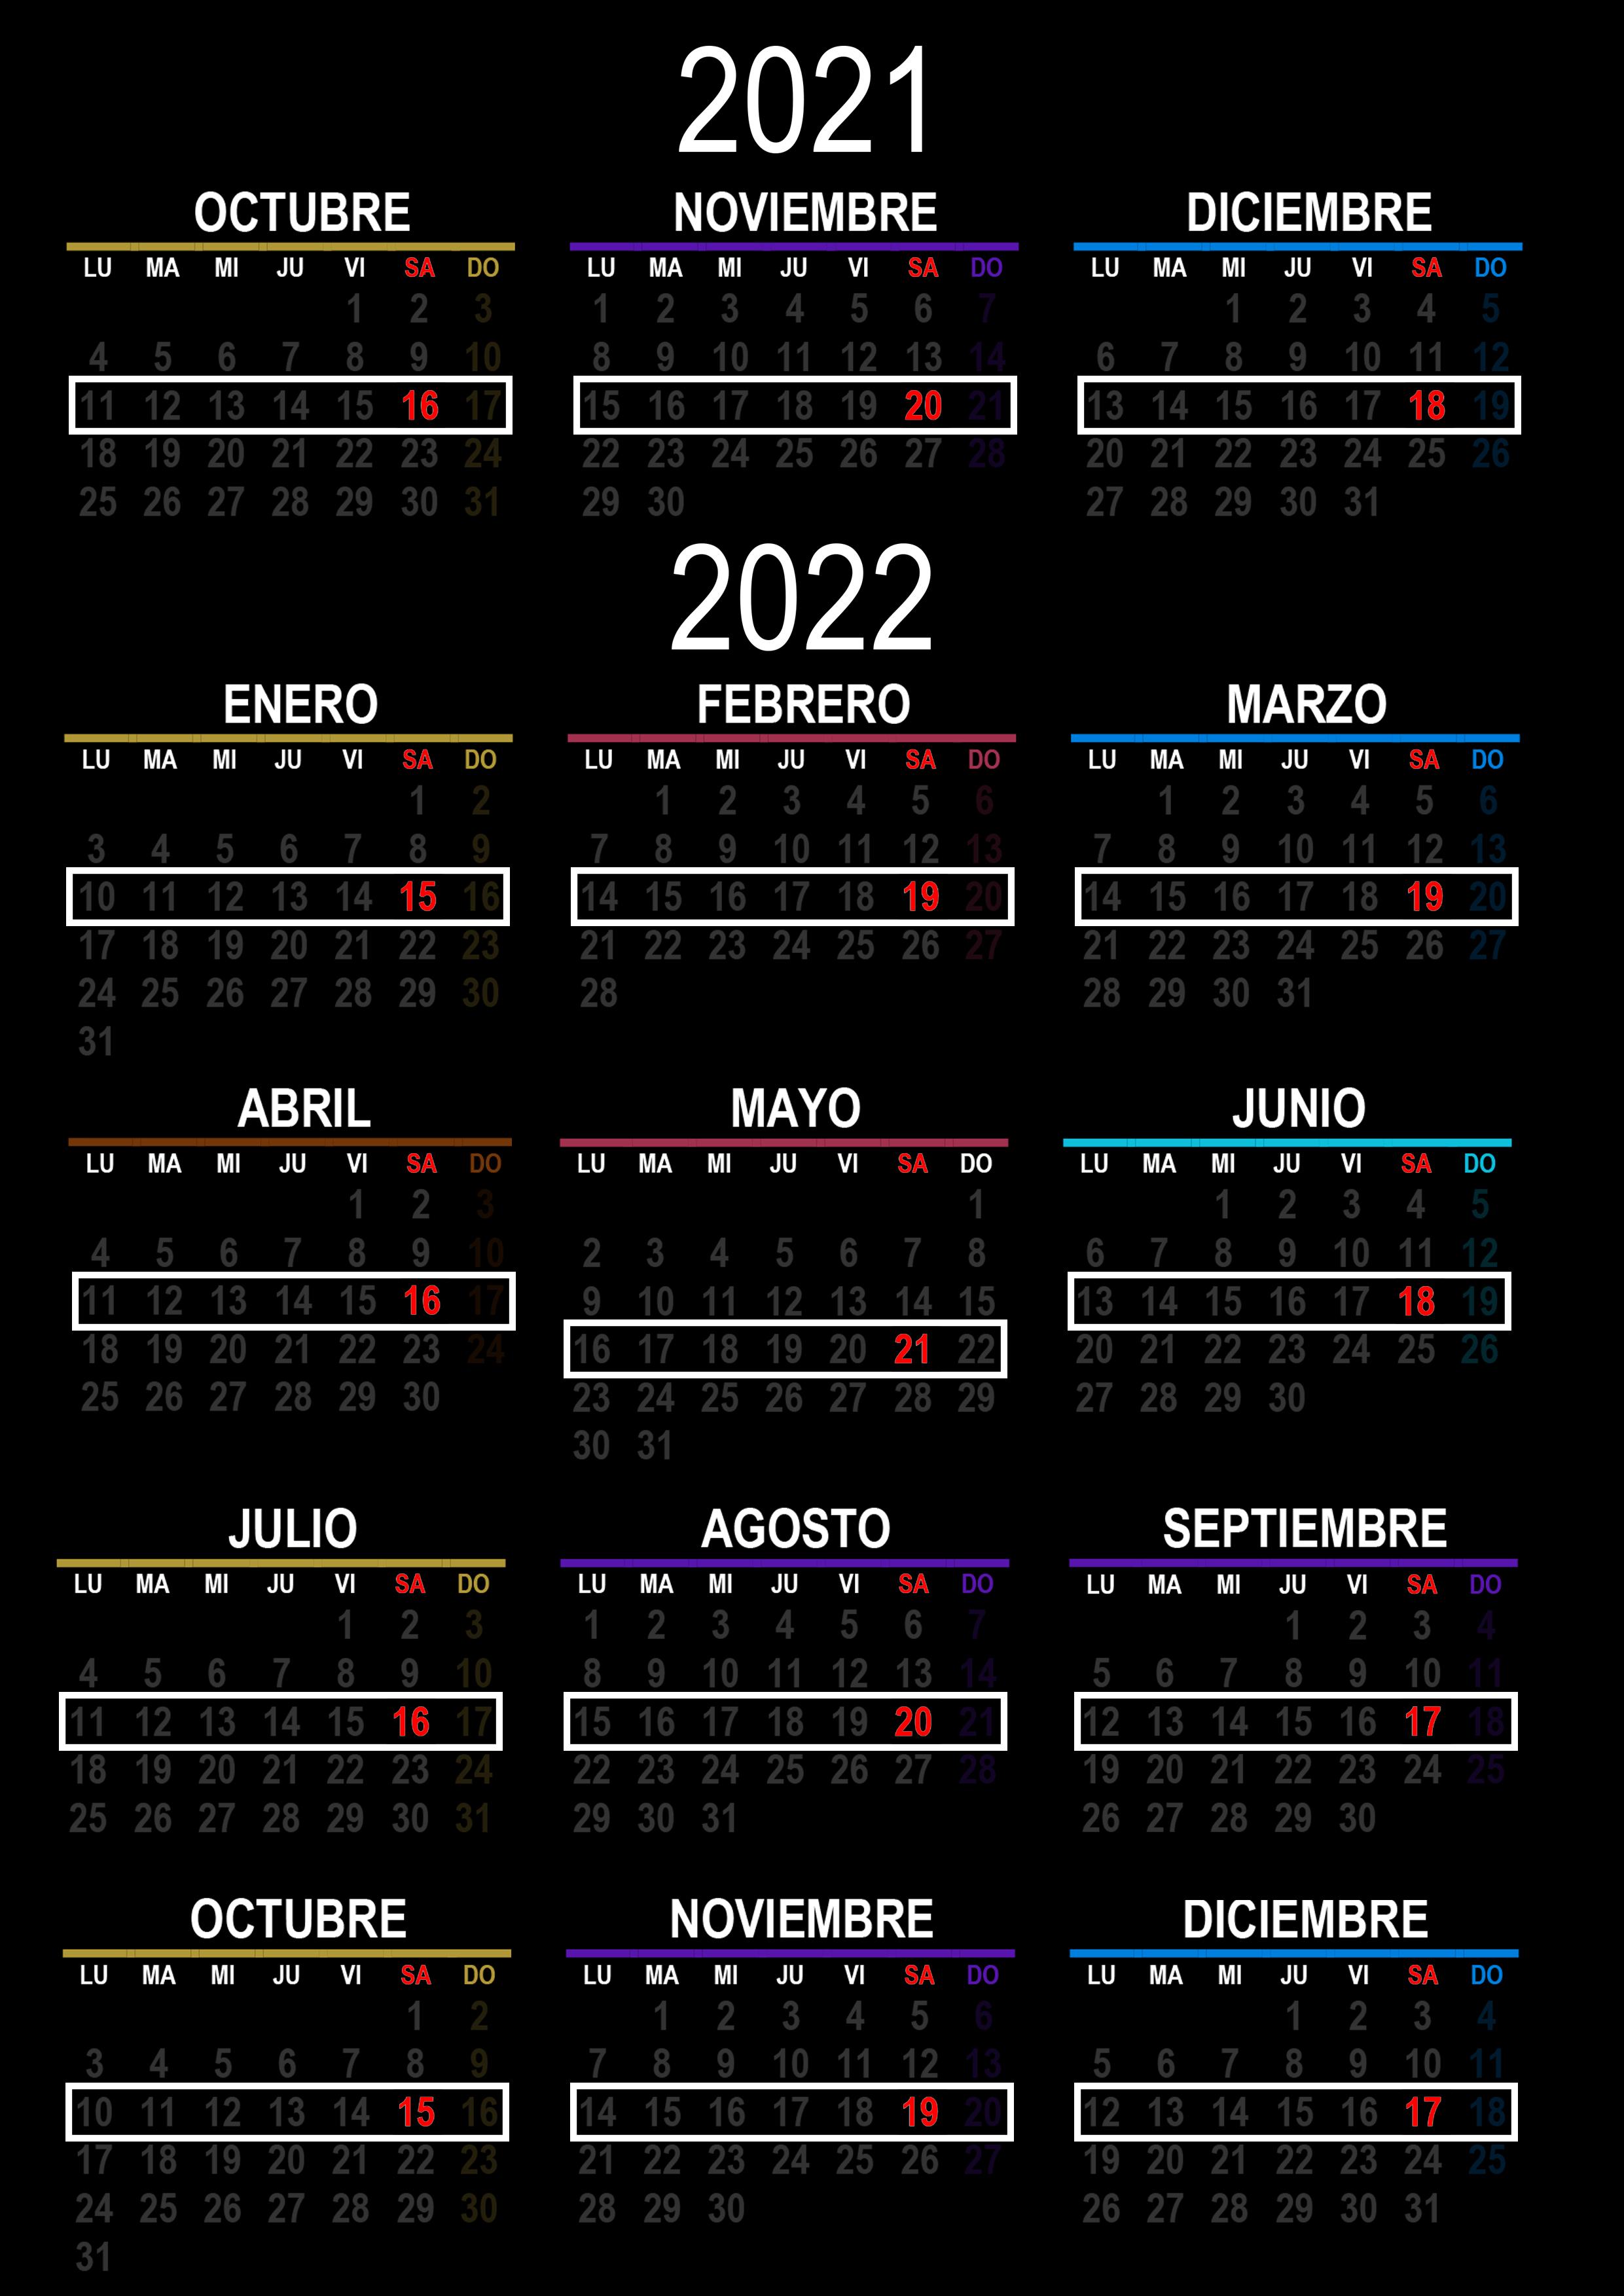 Milongas 2021 2022